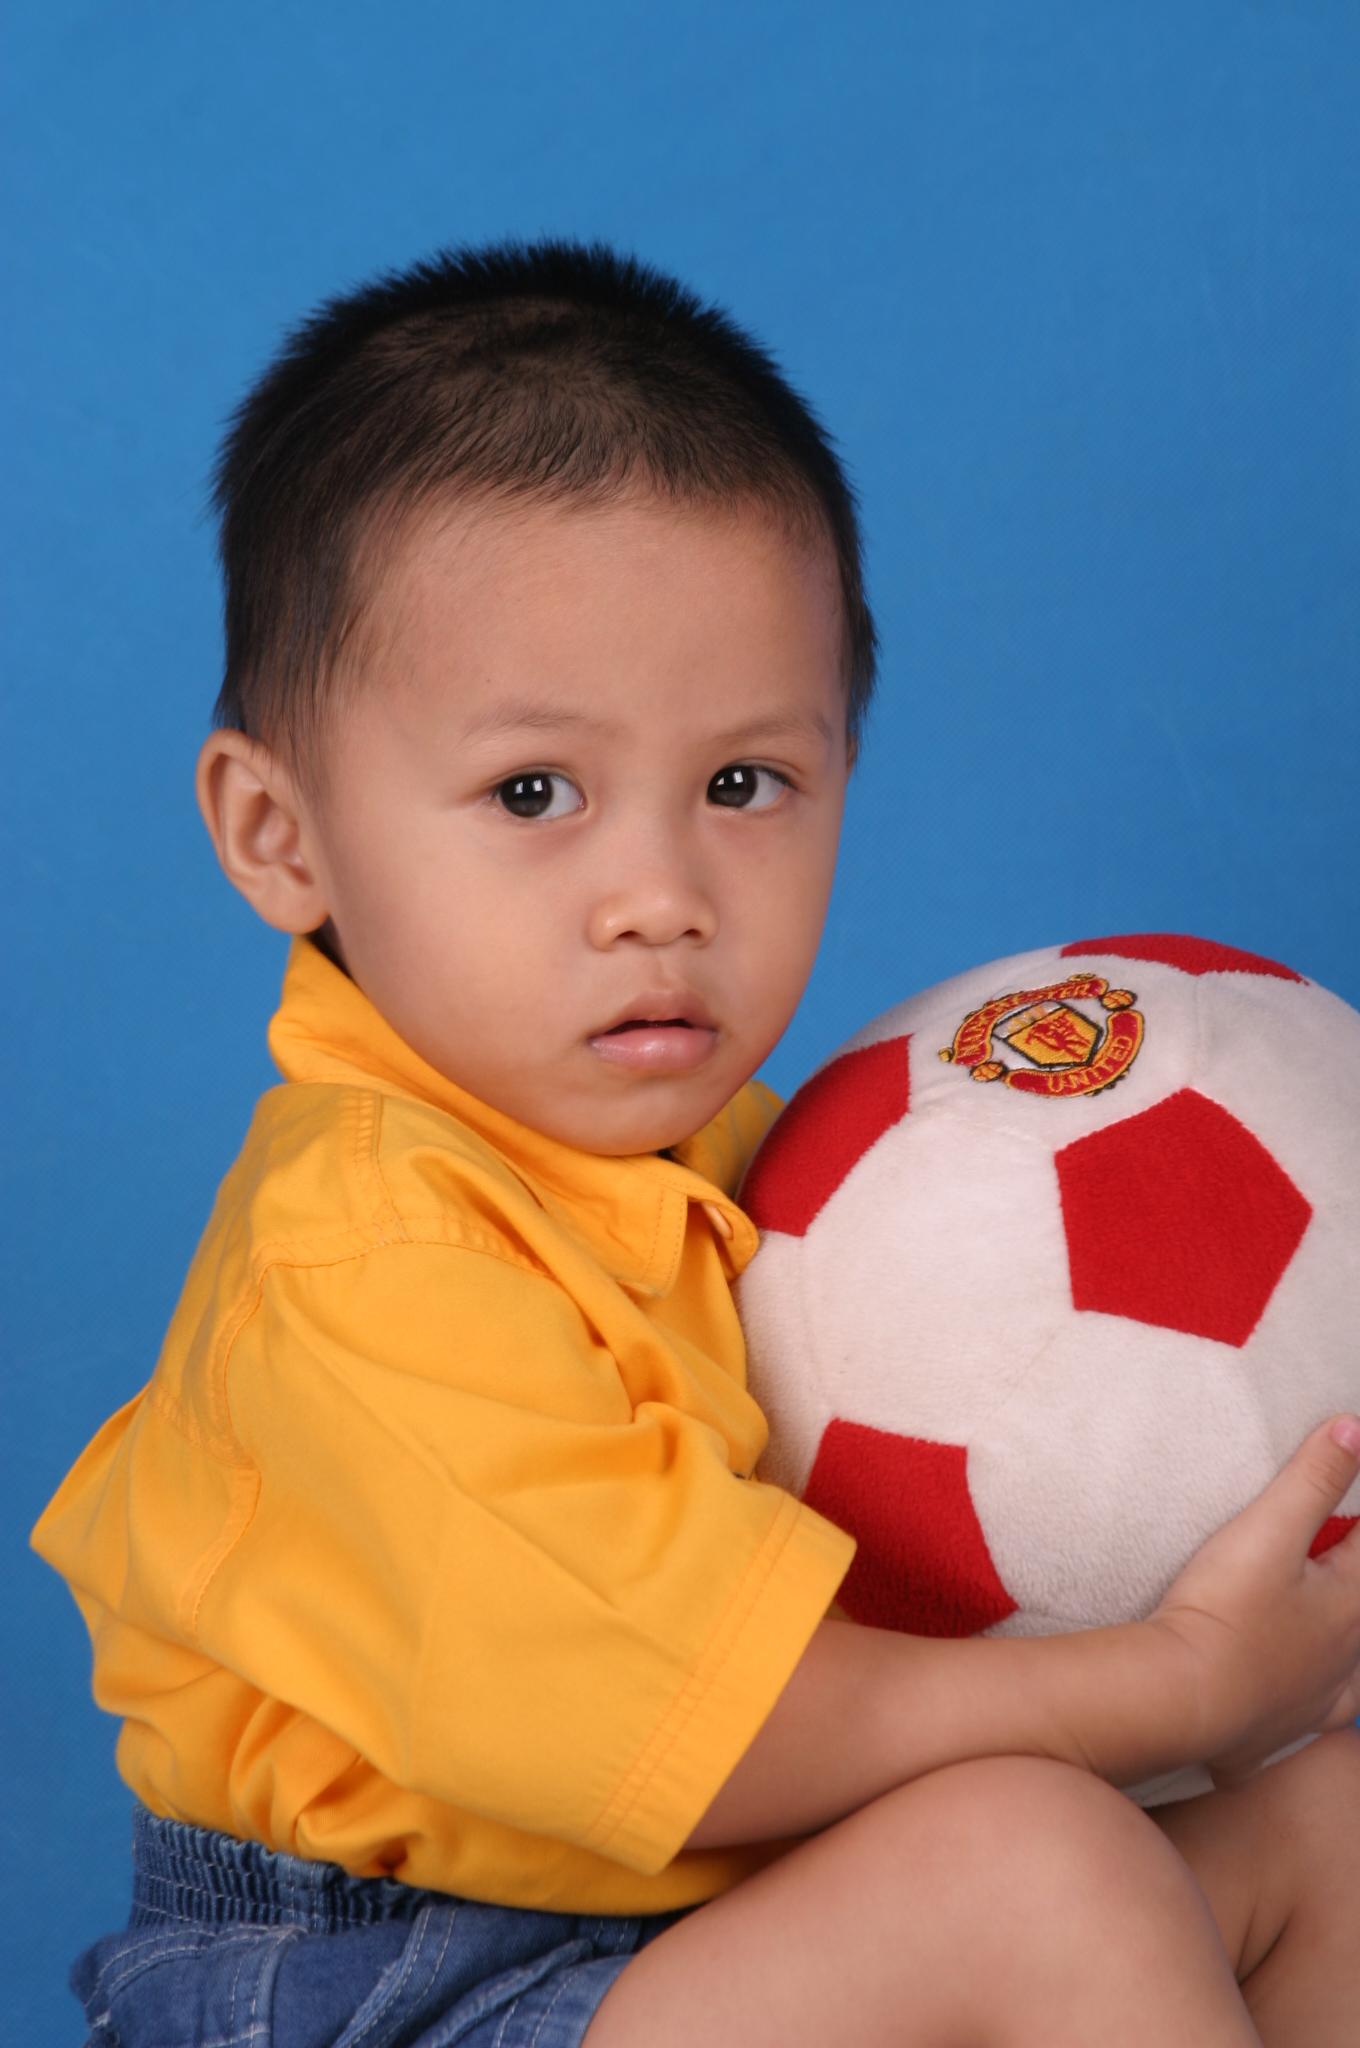 Bim Bim Pump, Ball, Kid, Yellow, United, HQ Photo